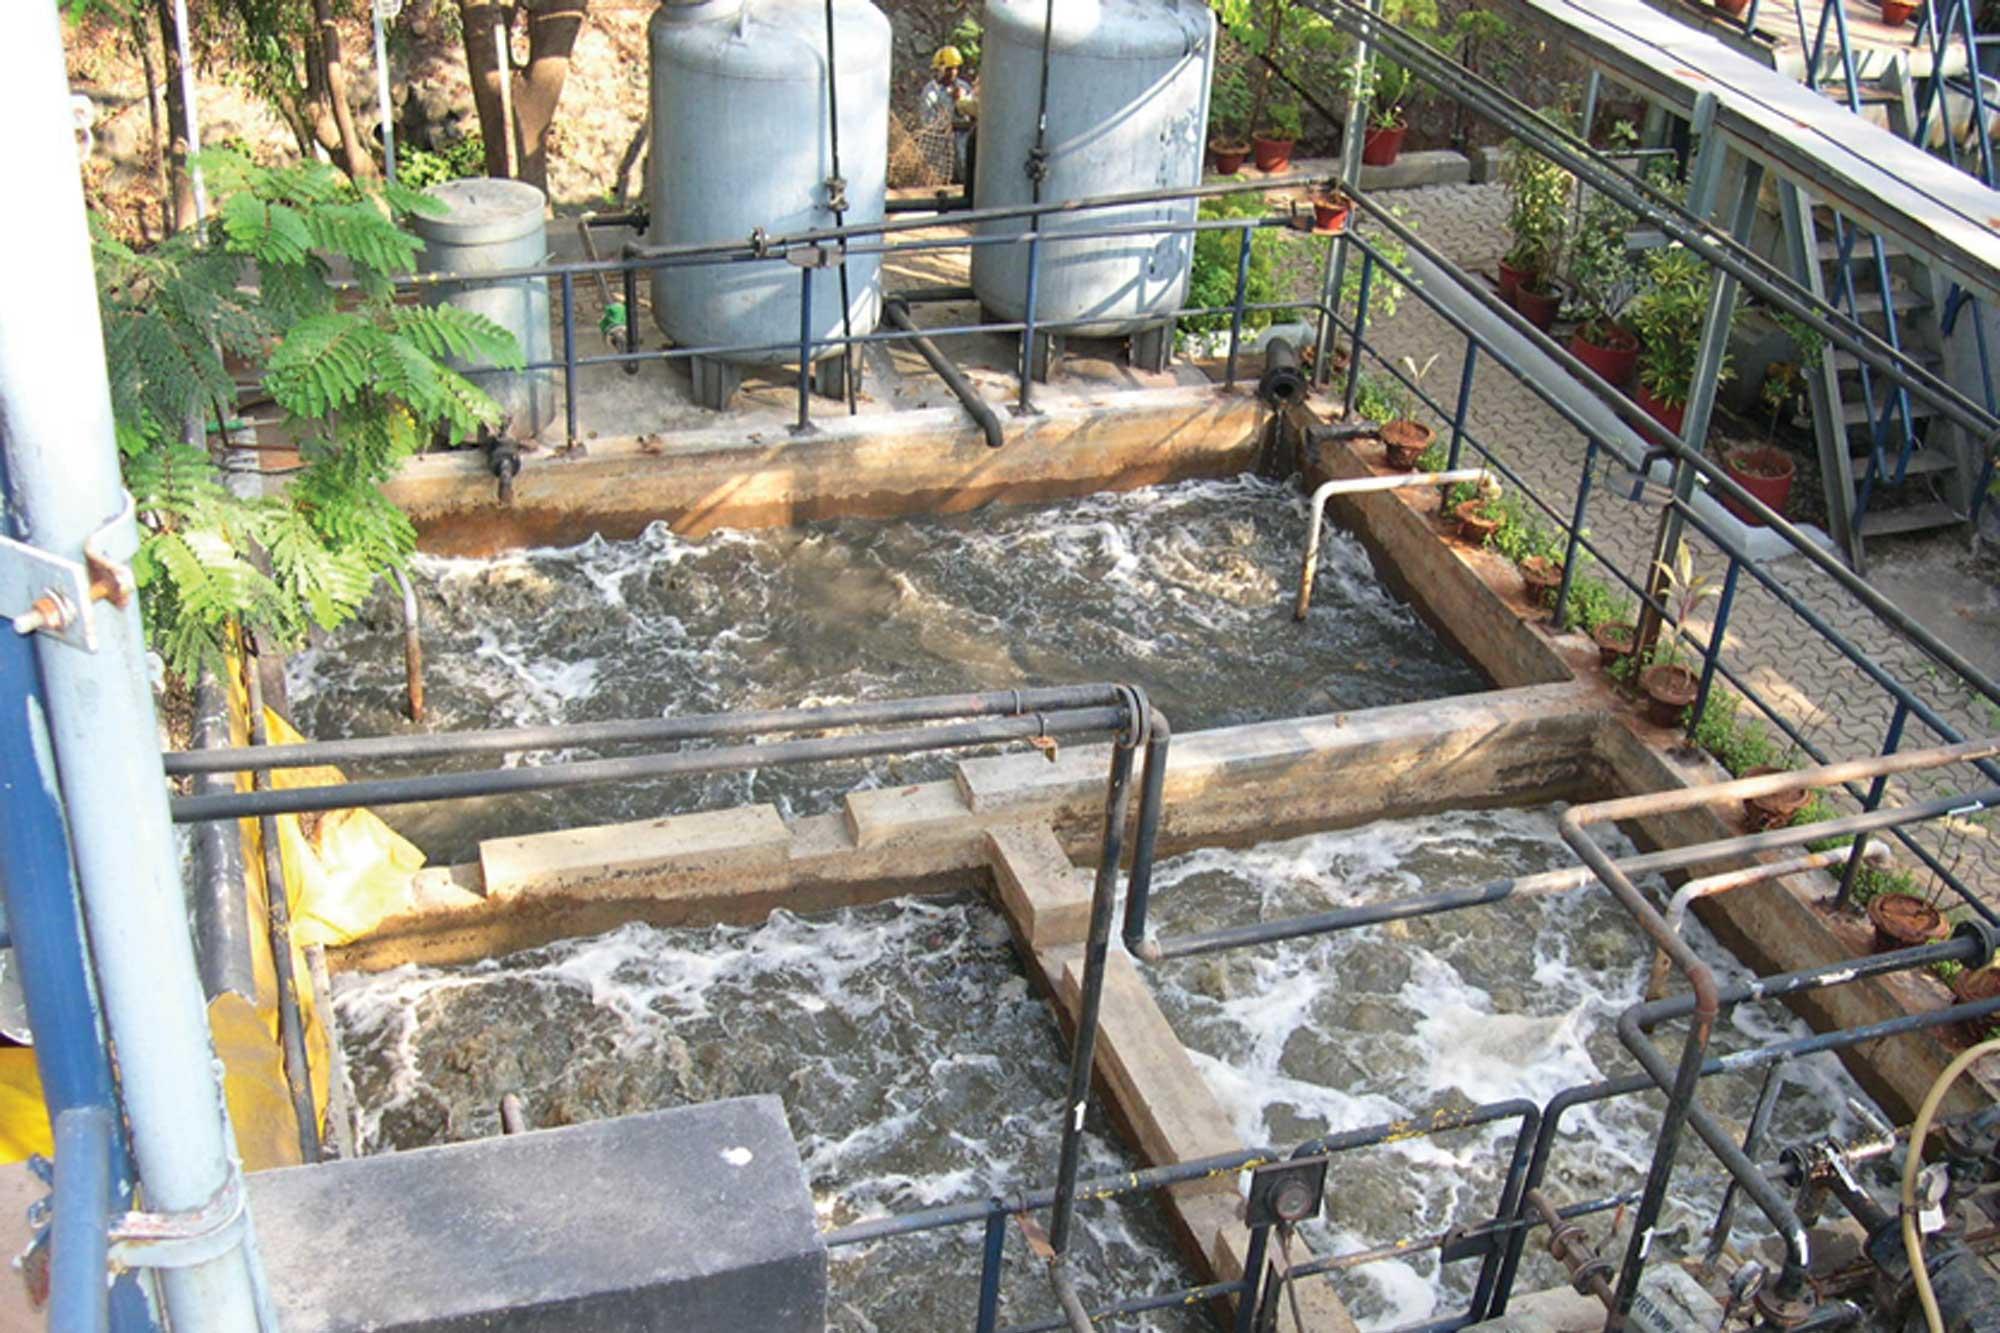 COD reduction in API (Bulk Drug) wastewater treatment plant